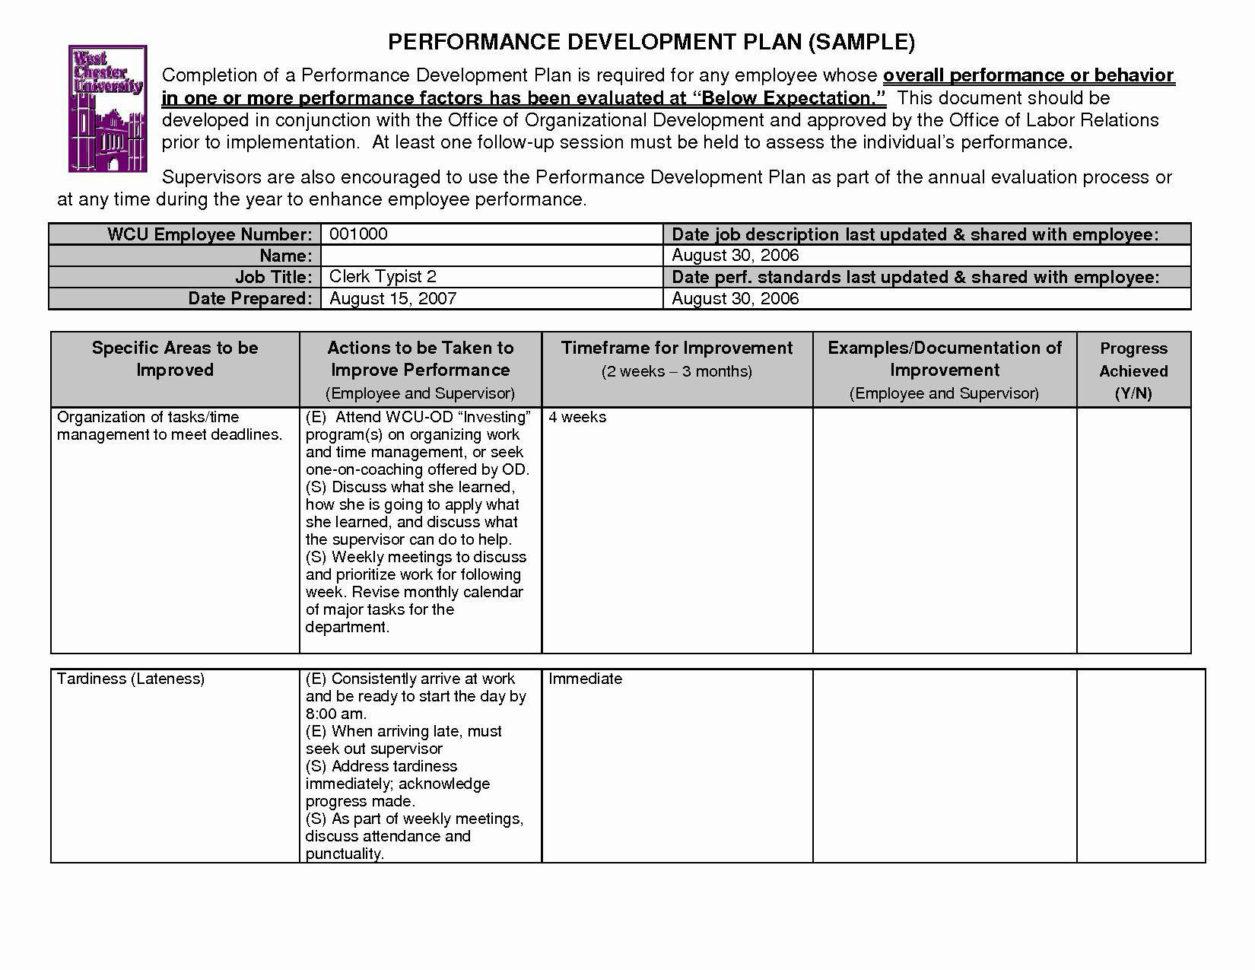 Performance Review Spreadsheet Inside Employee Performance Review Template Excel Unique Employee